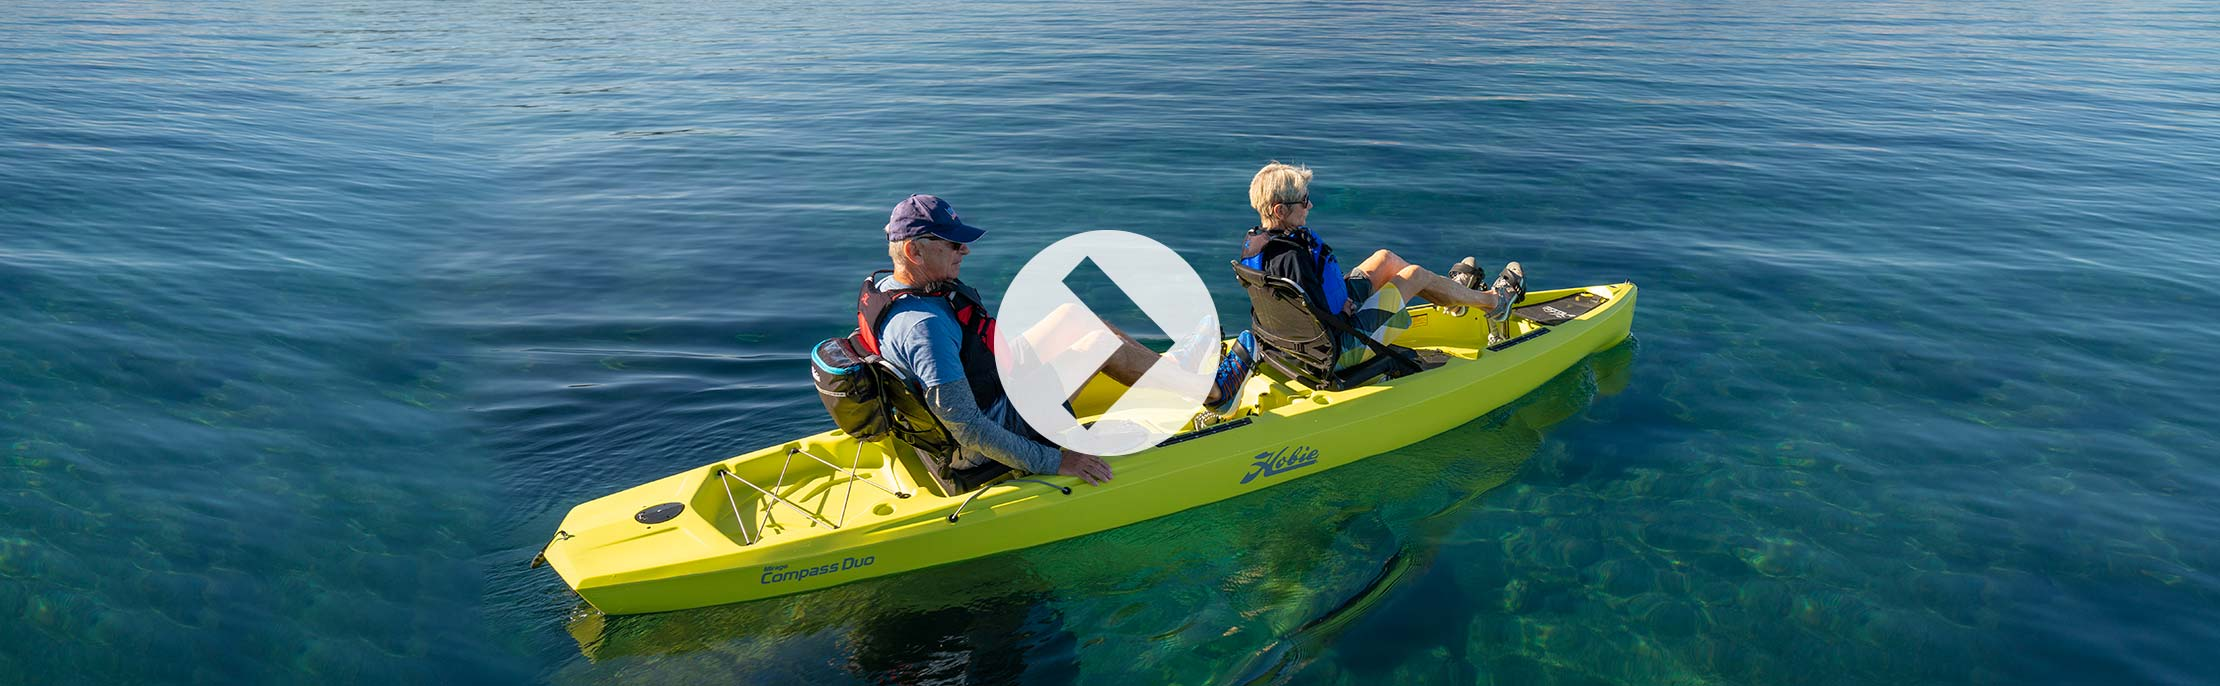 Mirage Compass Duo Spotlight Video